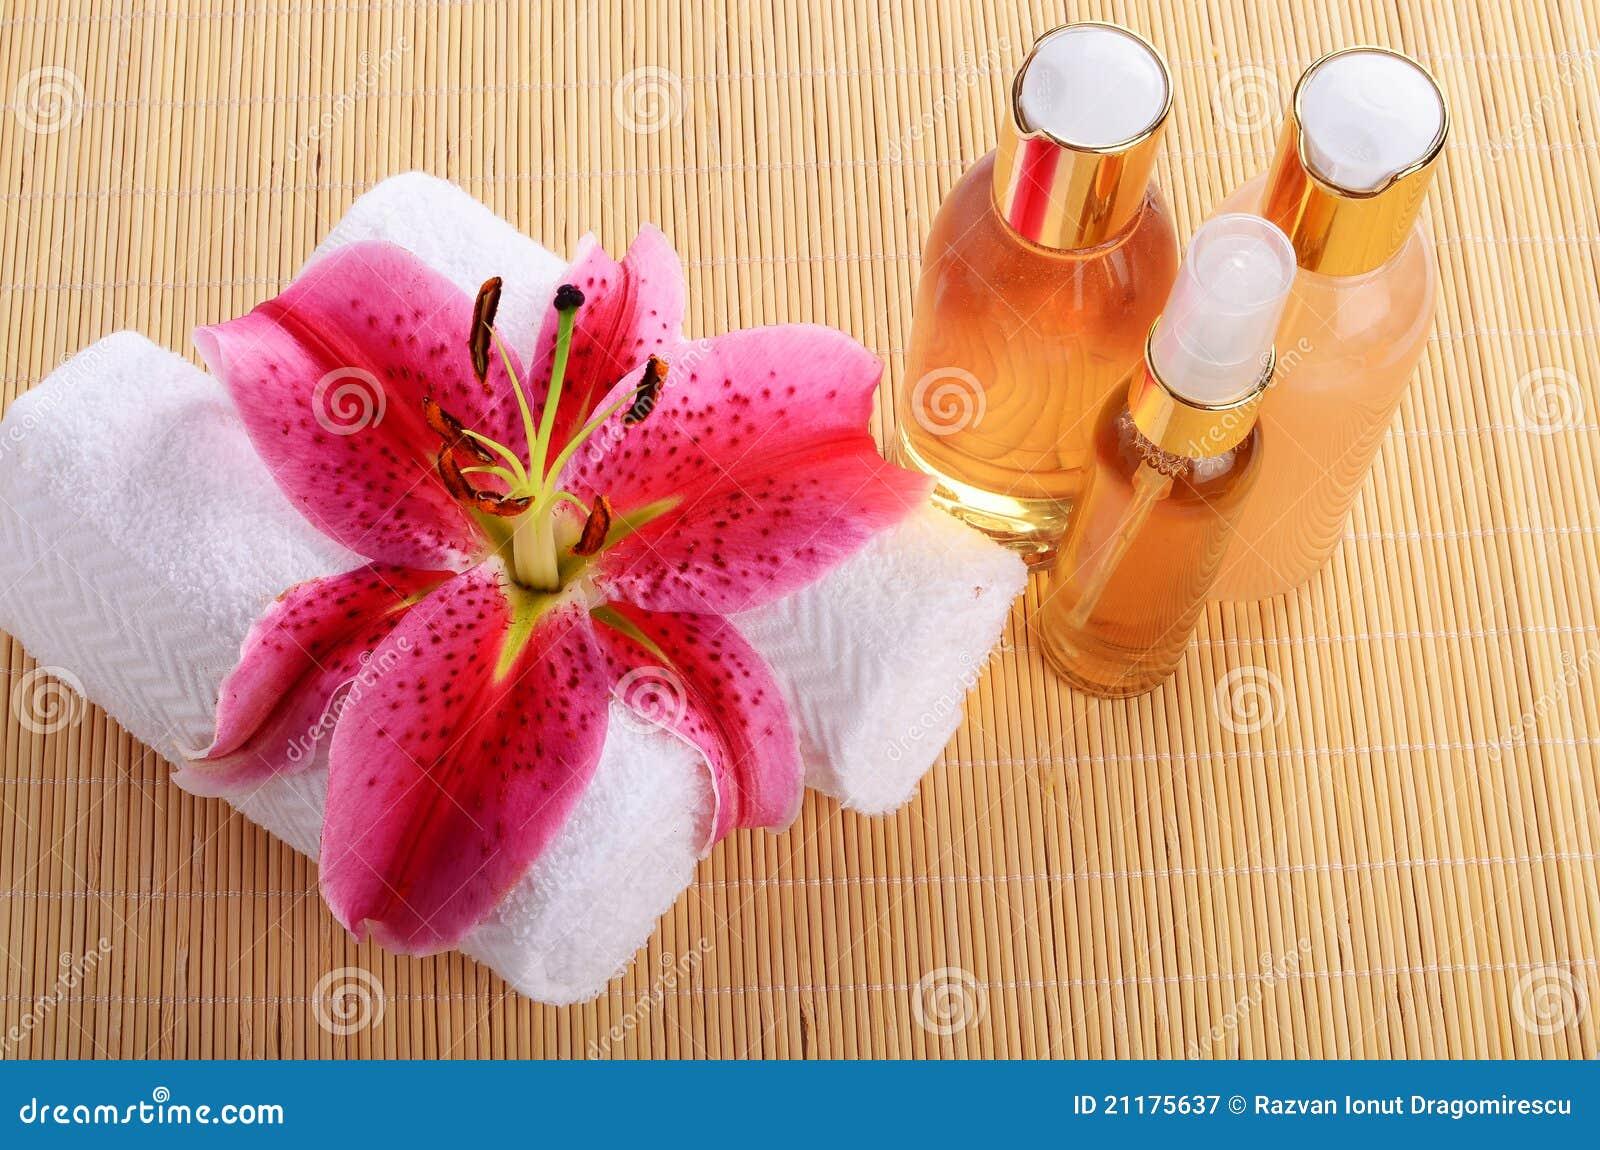 Aromatic Spa Oils